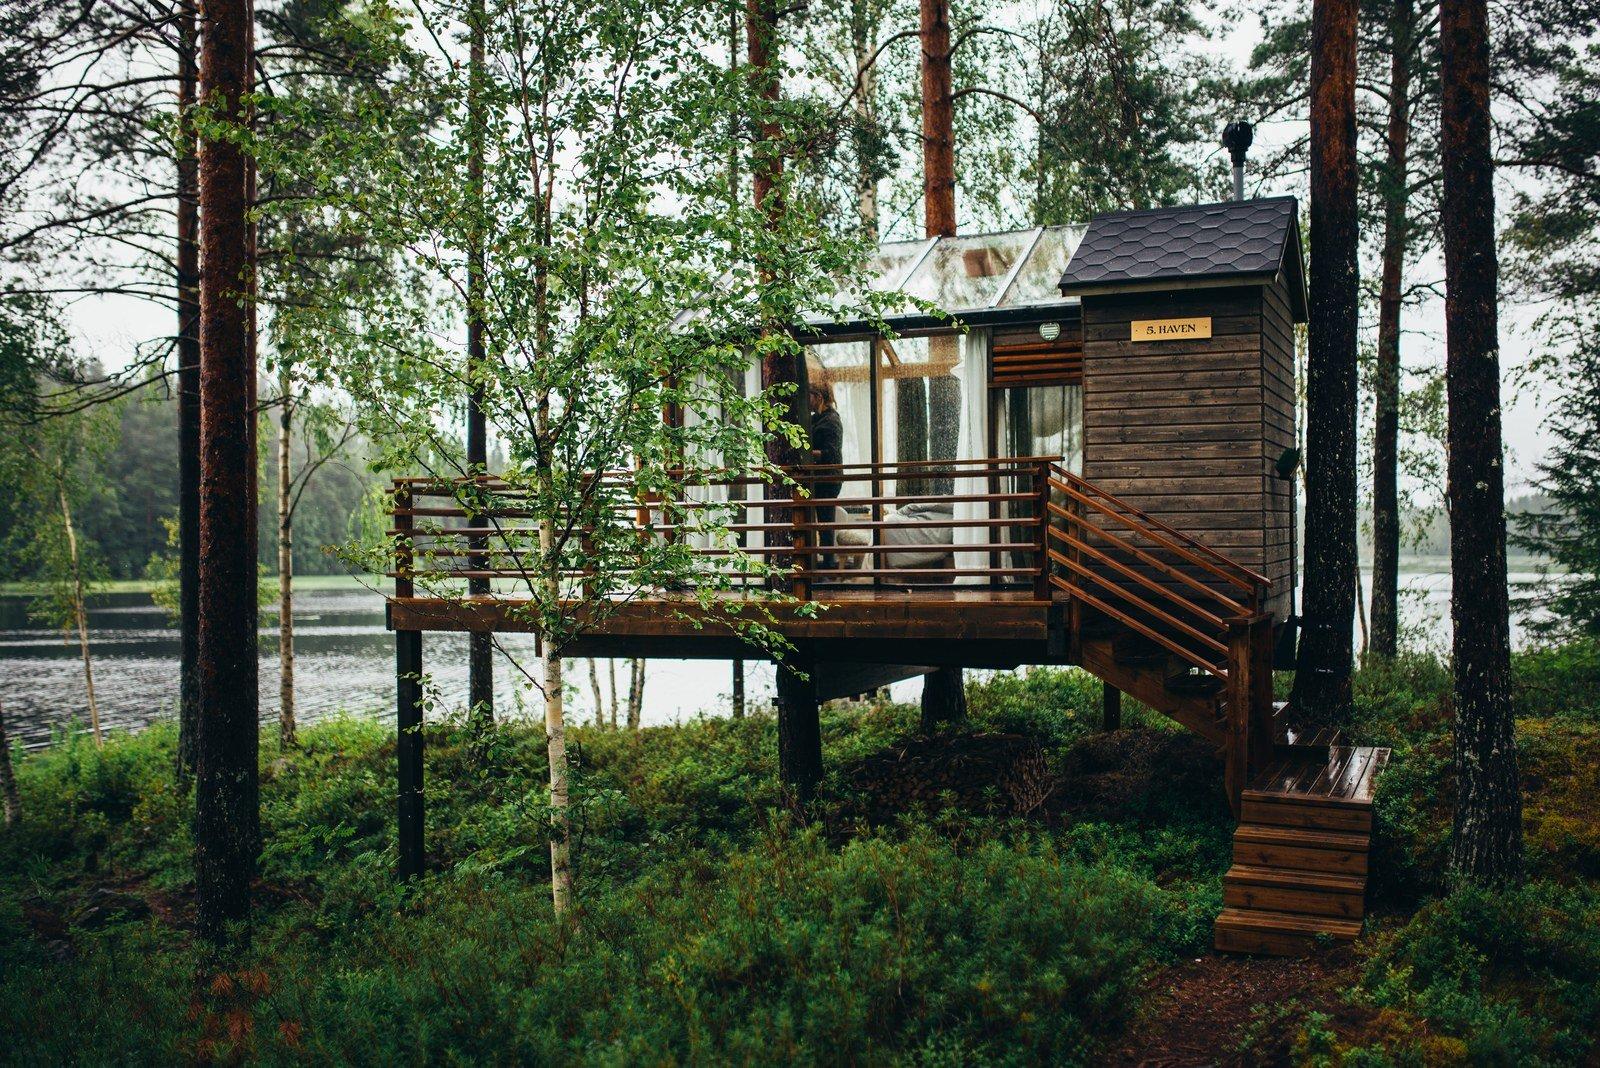 notre cabane dans la foret pour la nuit oulu en finlande. Black Bedroom Furniture Sets. Home Design Ideas